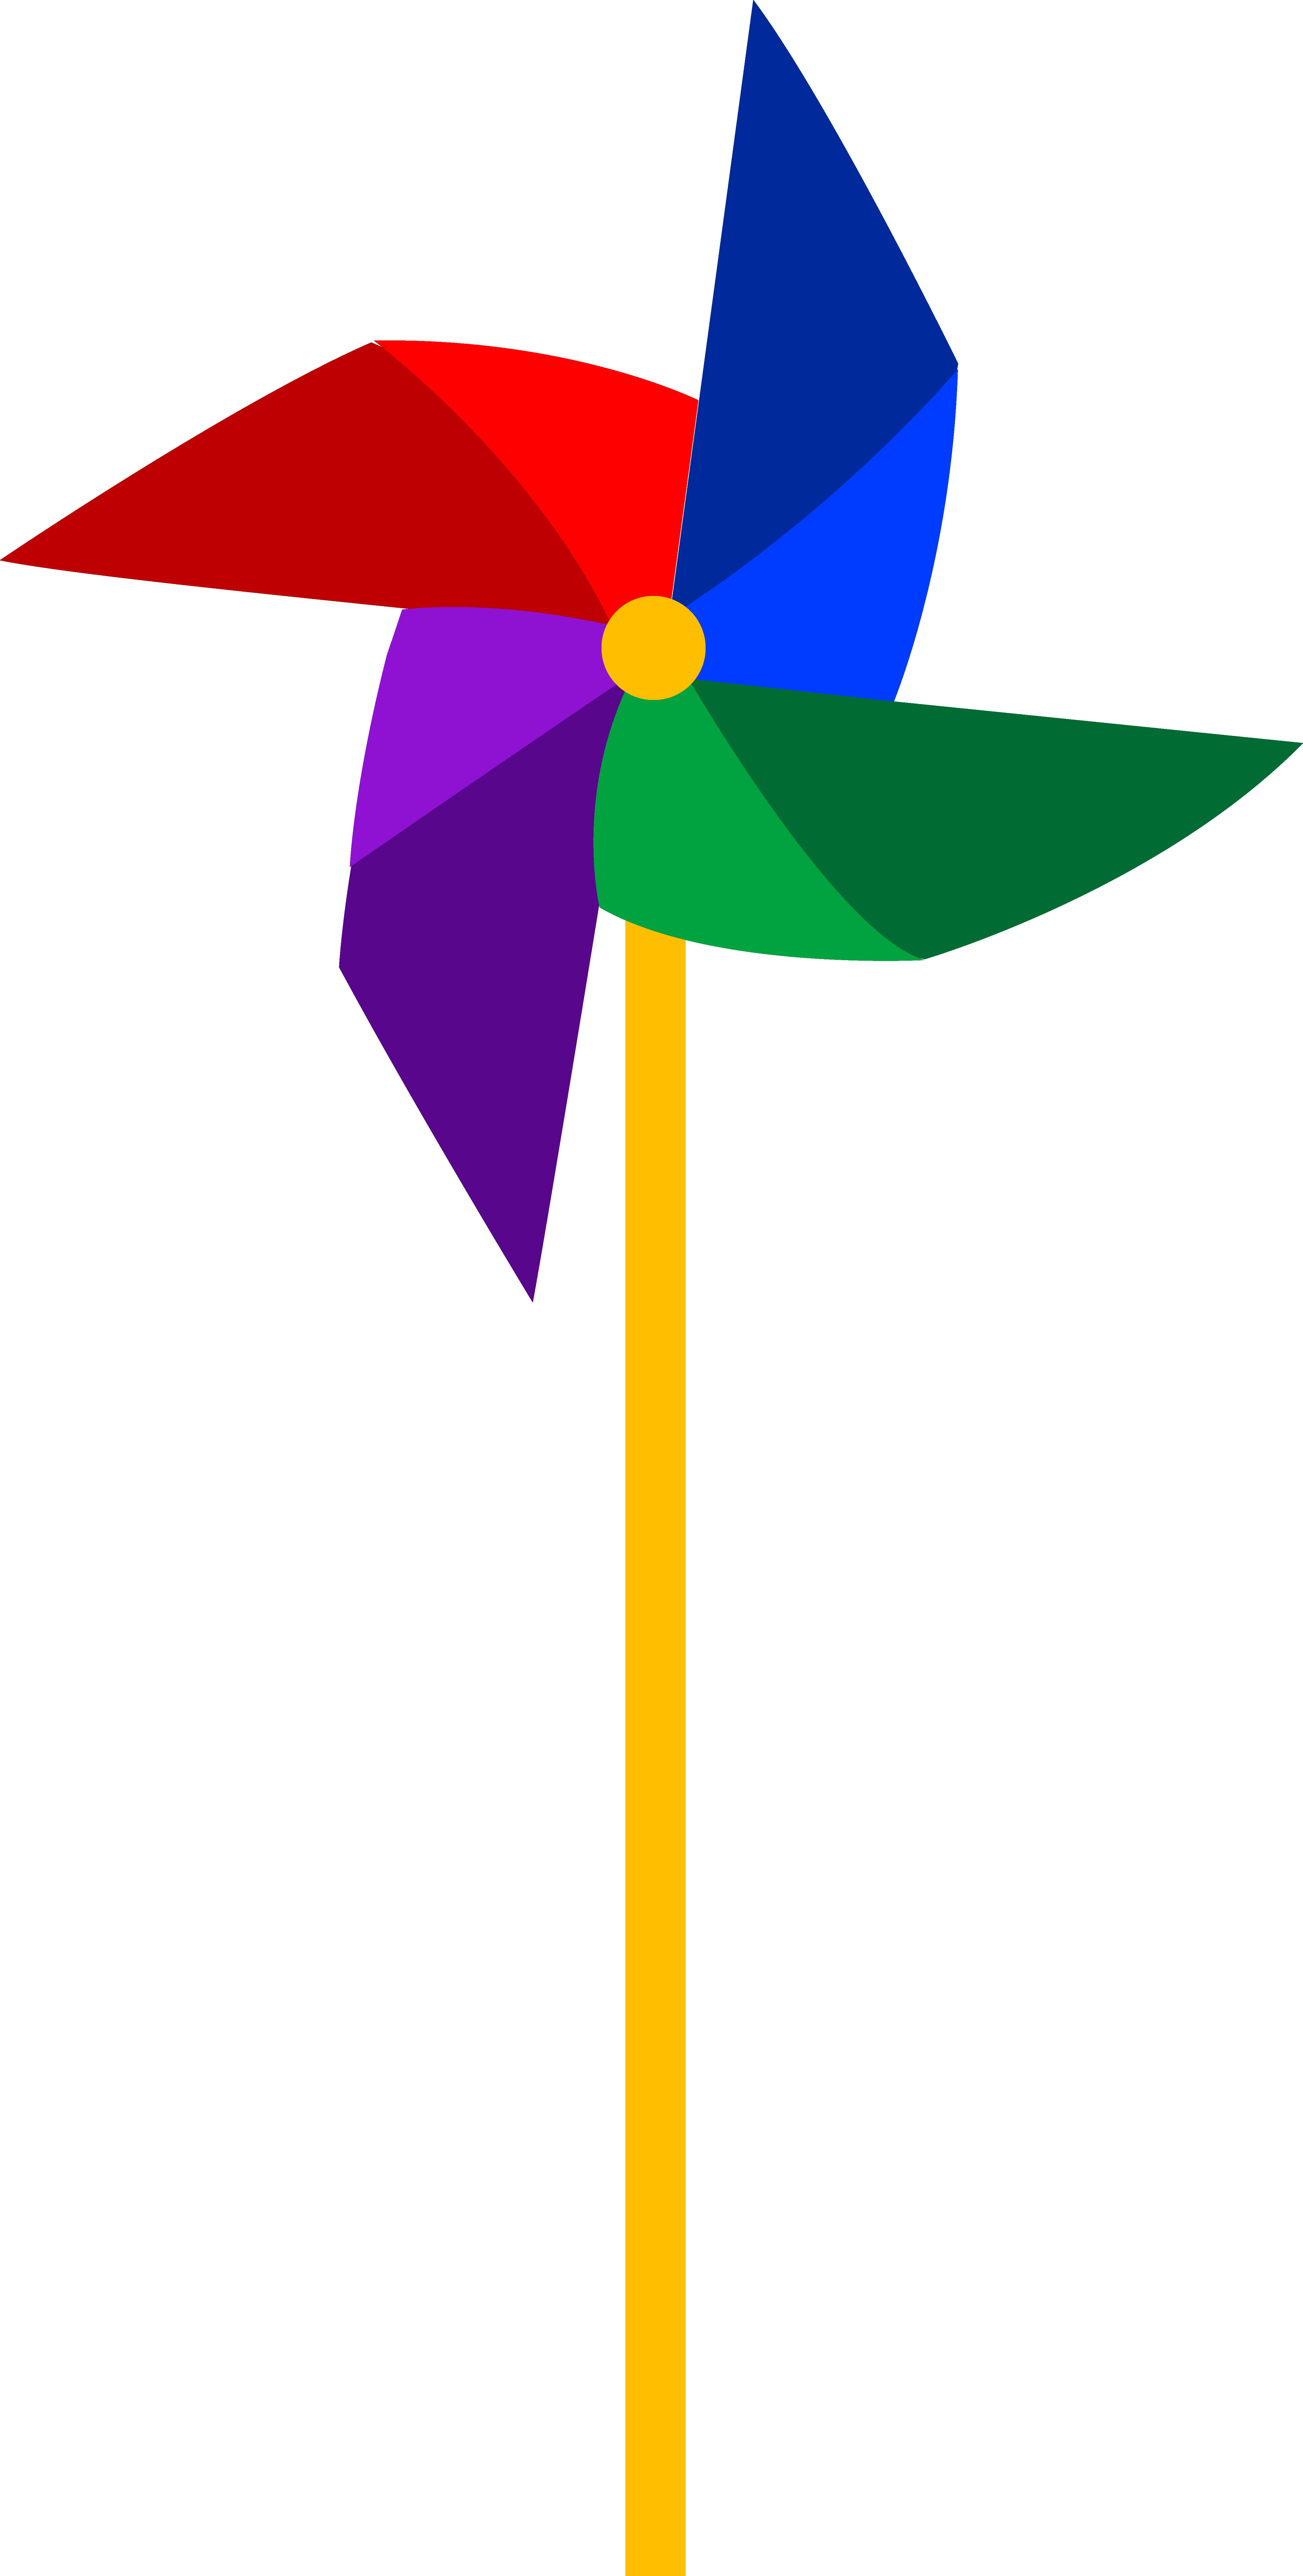 Mayflower flower clipart banner Clip art of a colorful pinwheel toy | Sweet Clip Art | Pinterest ... banner